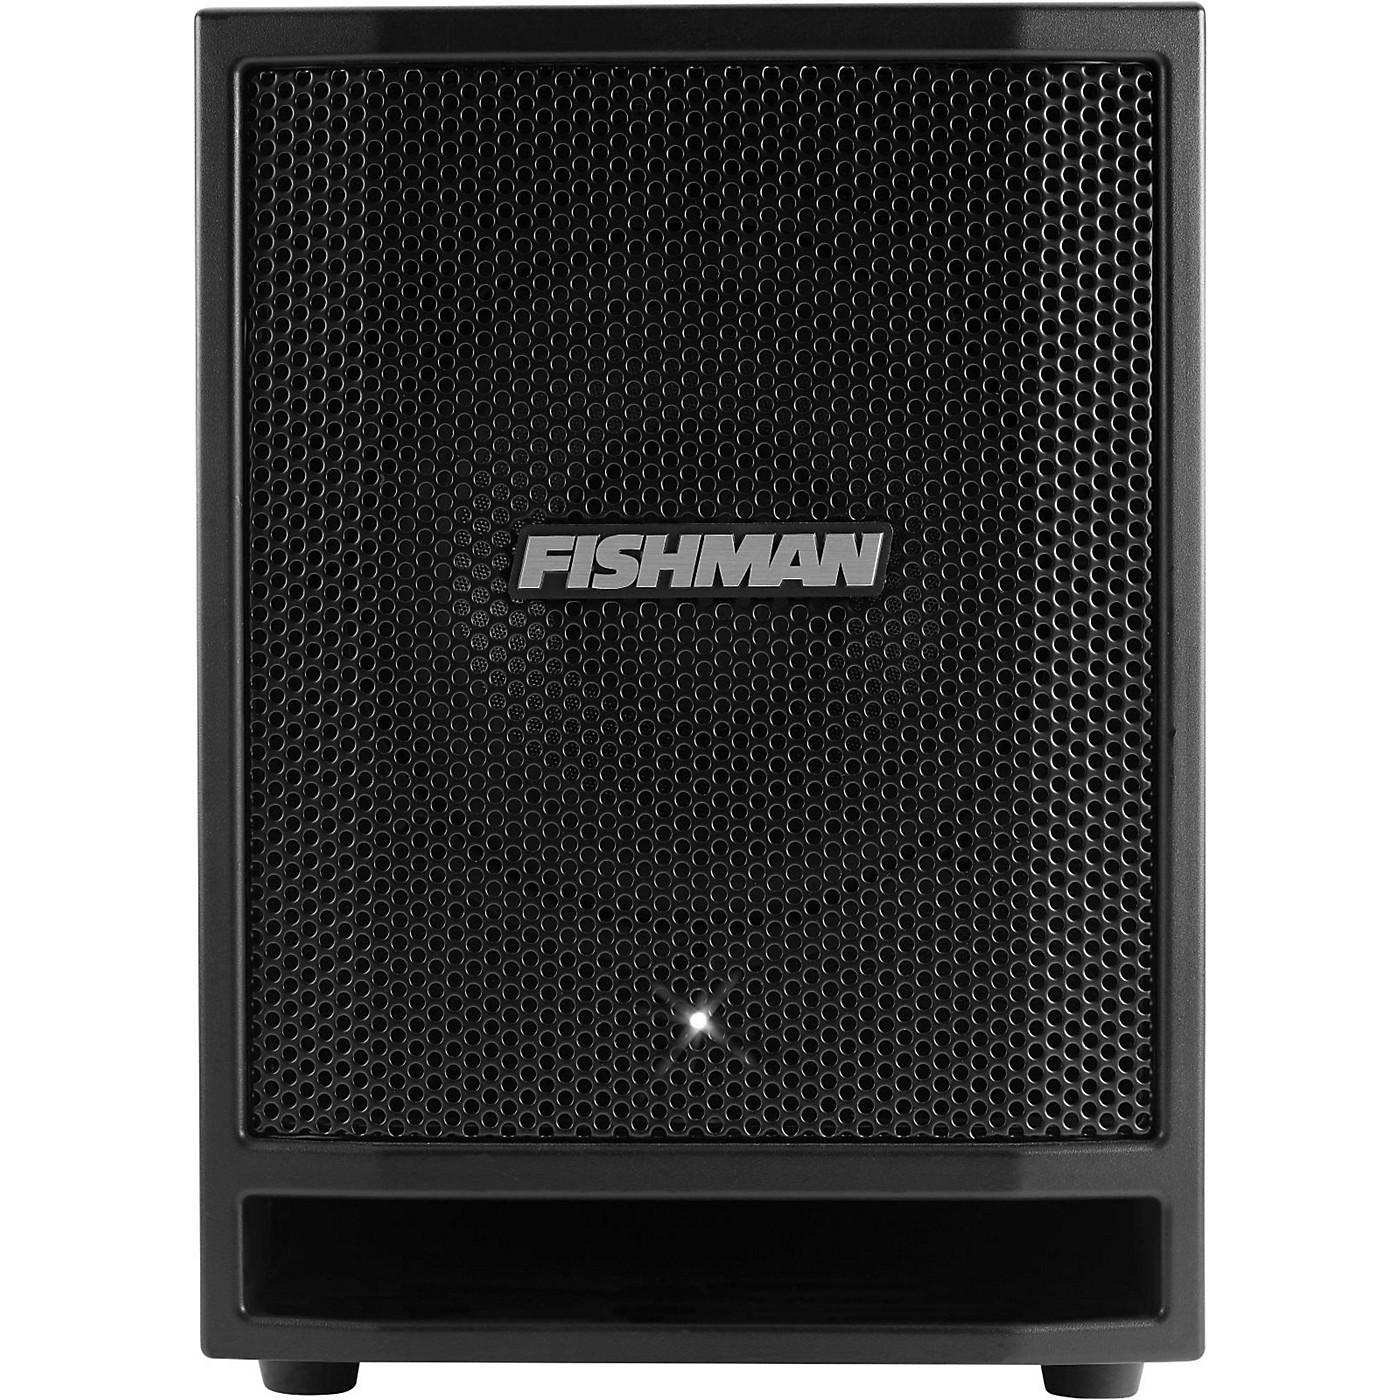 Fishman SA Sub 300W 1x8 Powered Subwoofer for SA330x thumbnail